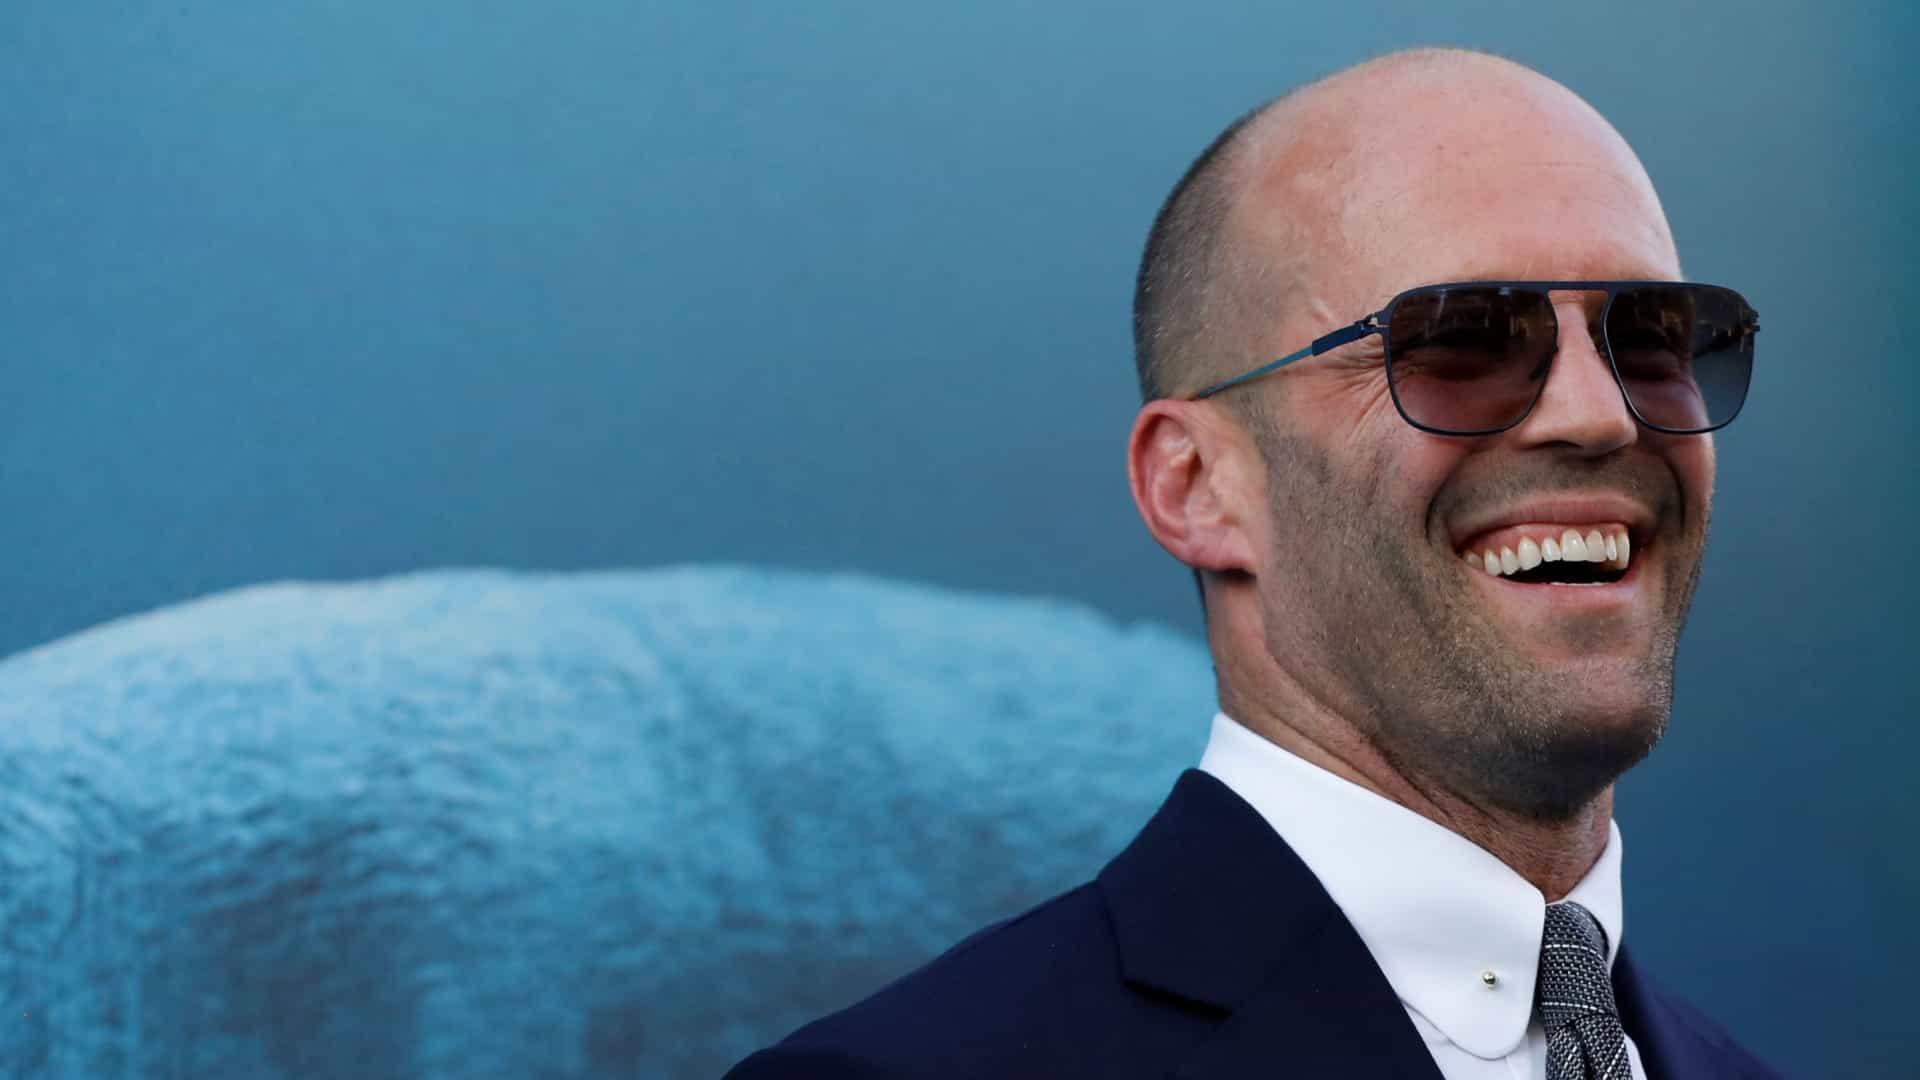 Padre amoroso: Jason Statham 'atrapado' con su hijo